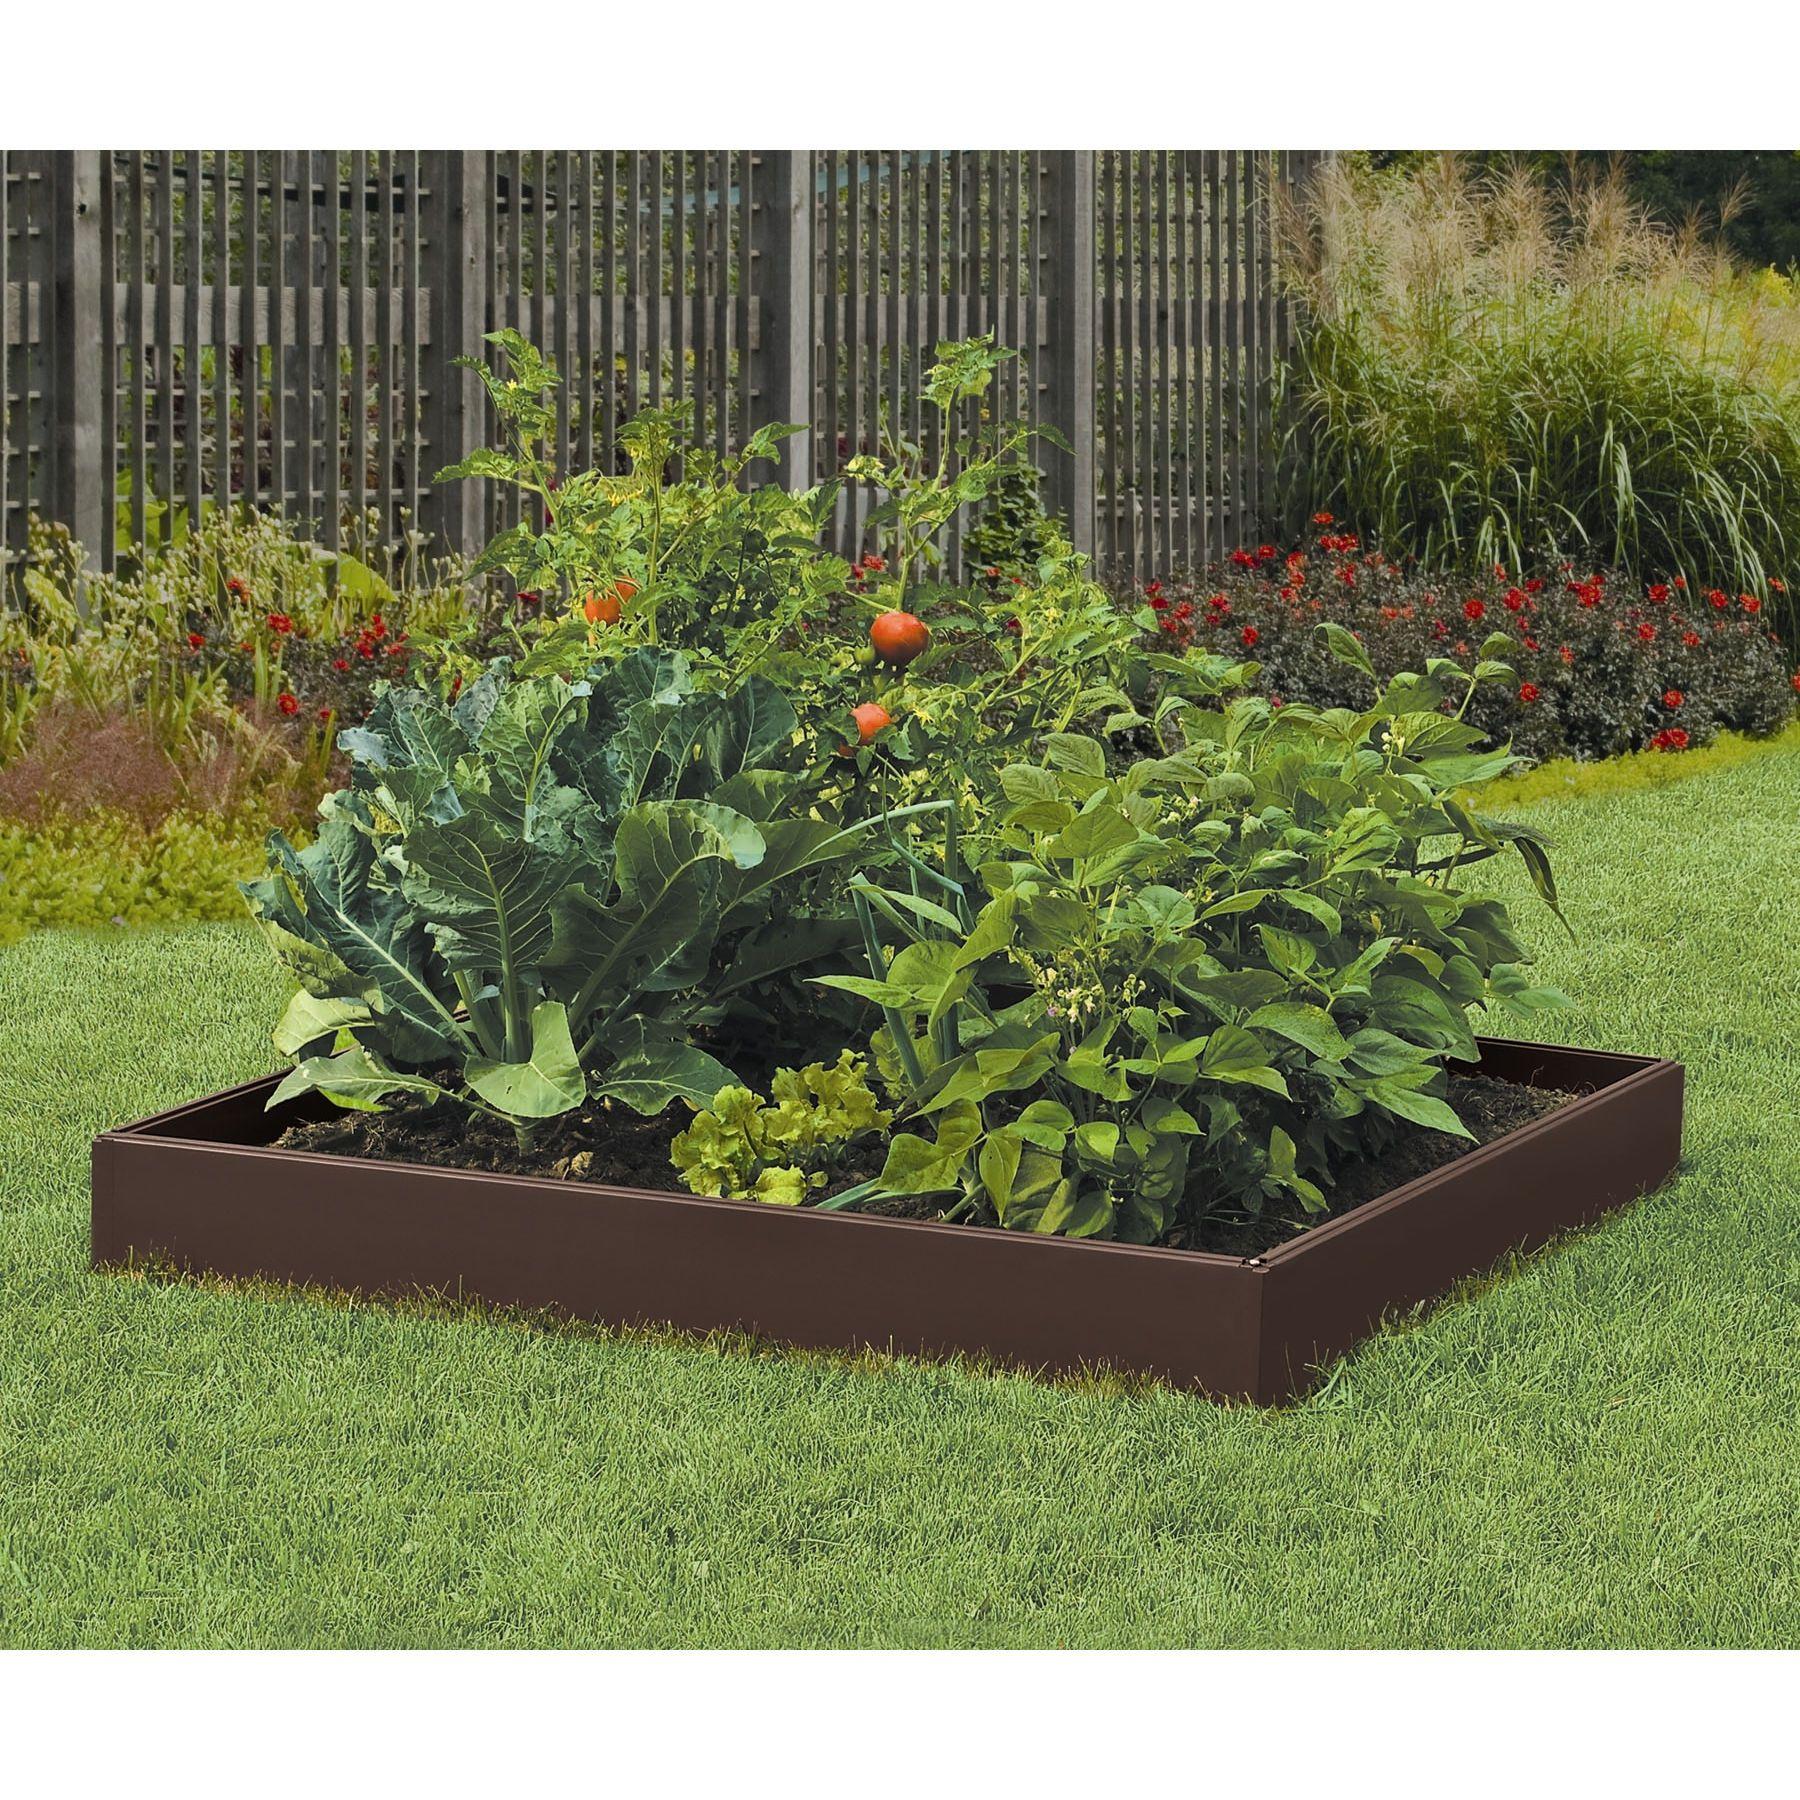 Resin Raised Garden Raised garden kits, Raised garden